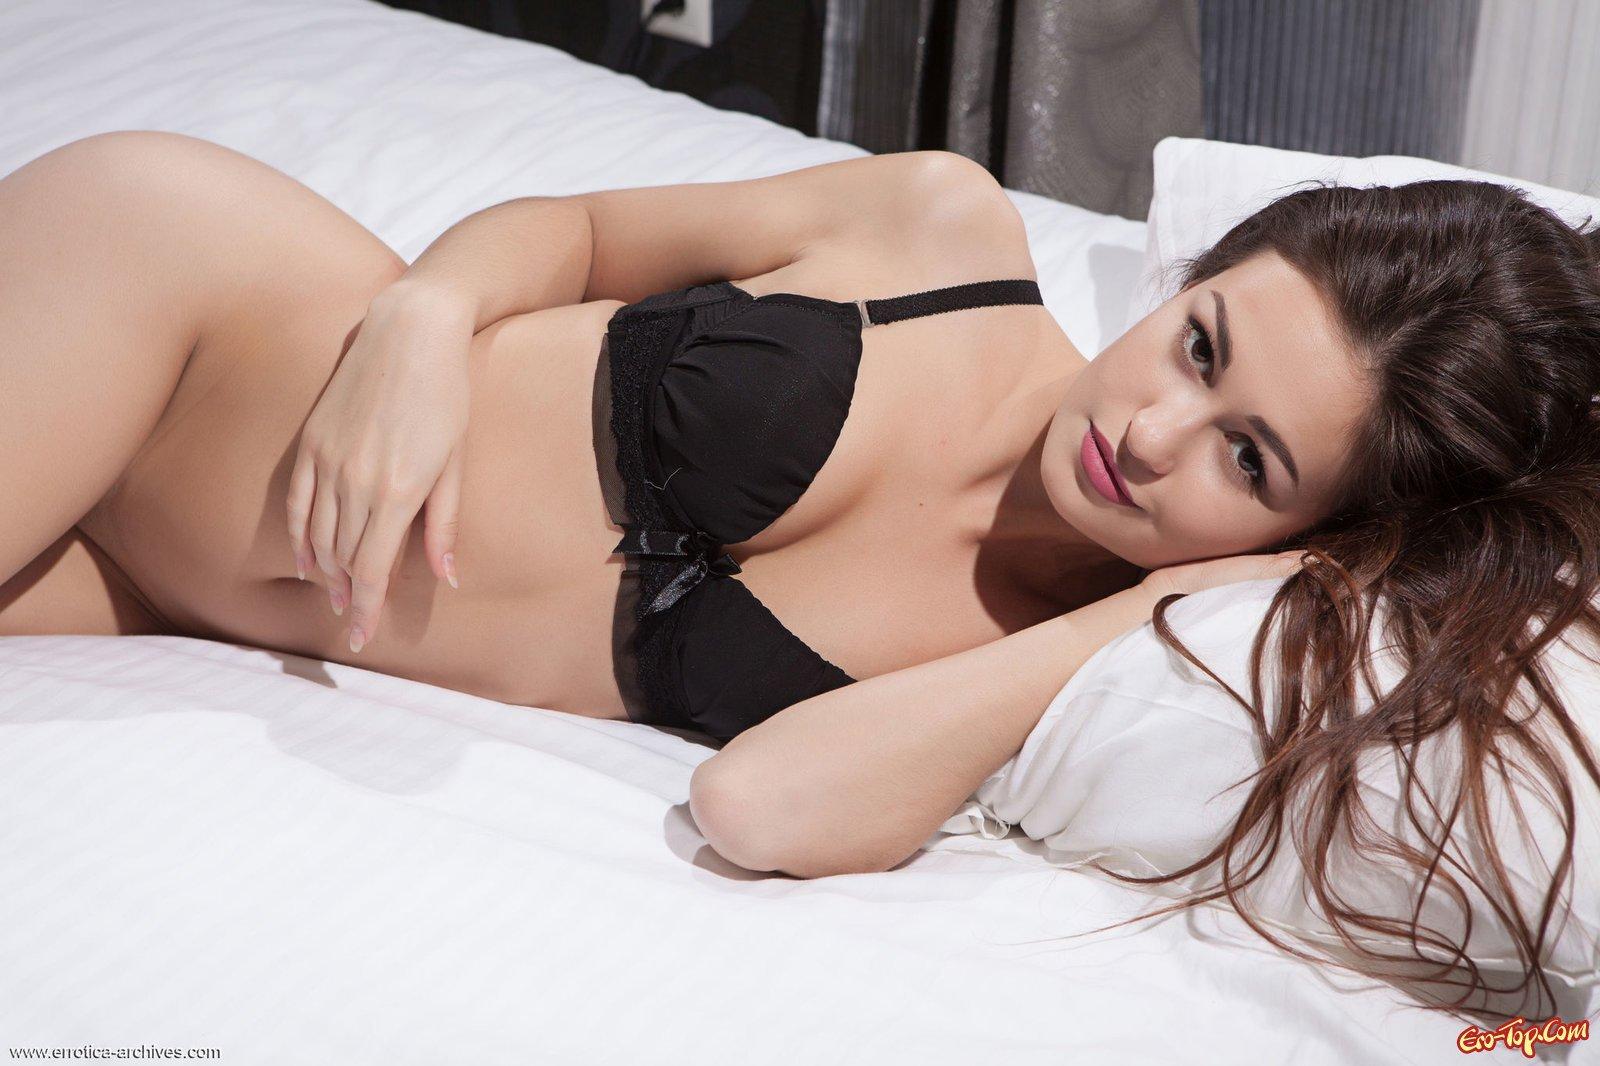 Милашка с гладкой кожей сняла лифчик до гола в койке секс фото